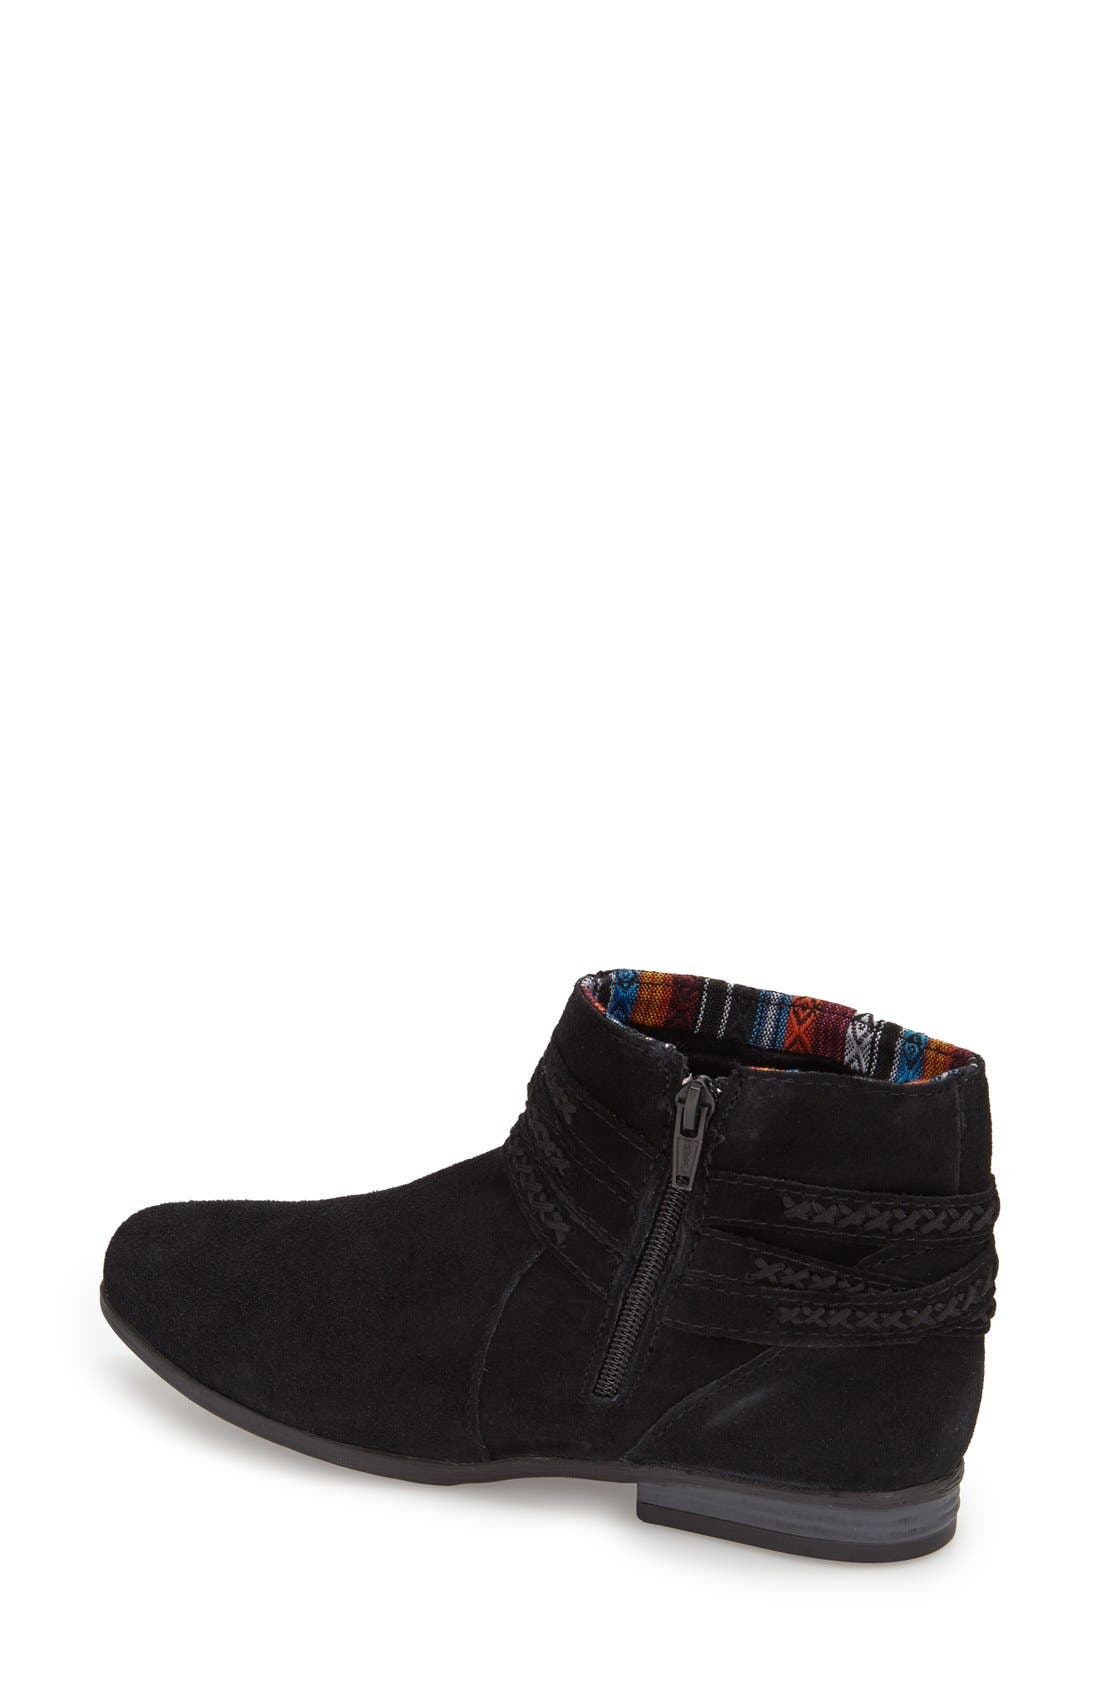 Alternate Image 2  - Minnetonka'Dixon' Boot (Women)